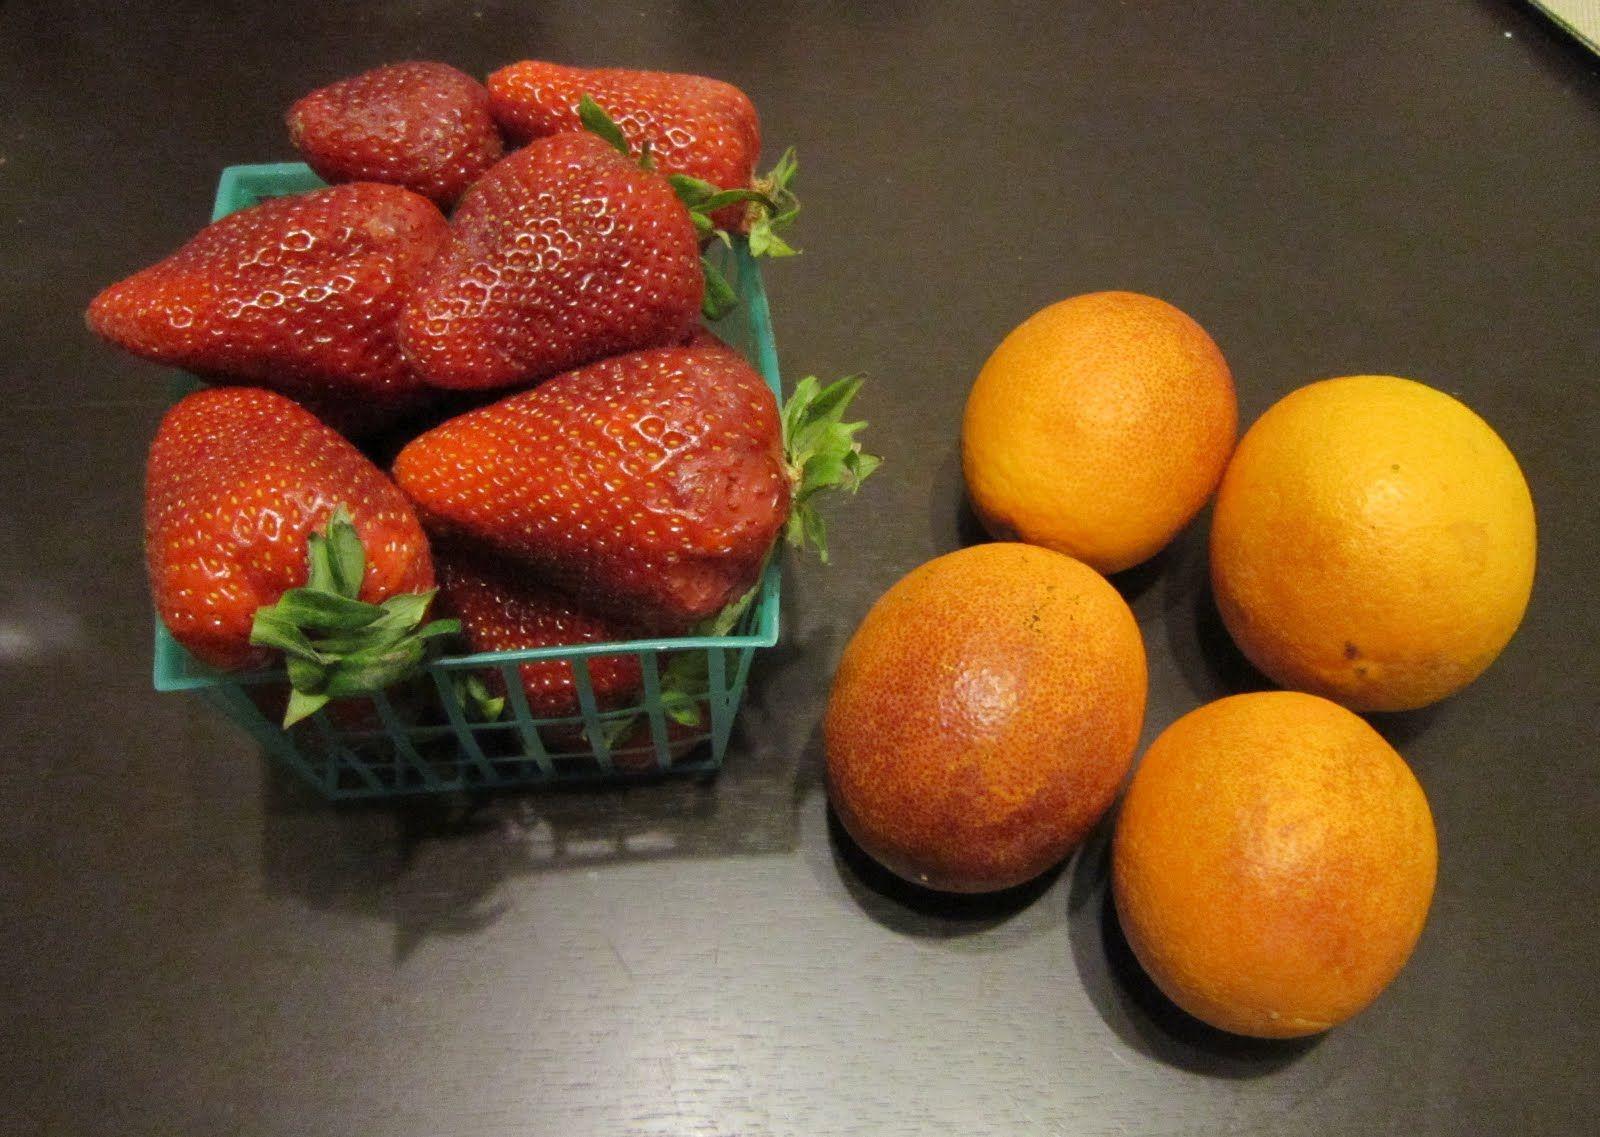 strawberry with orange